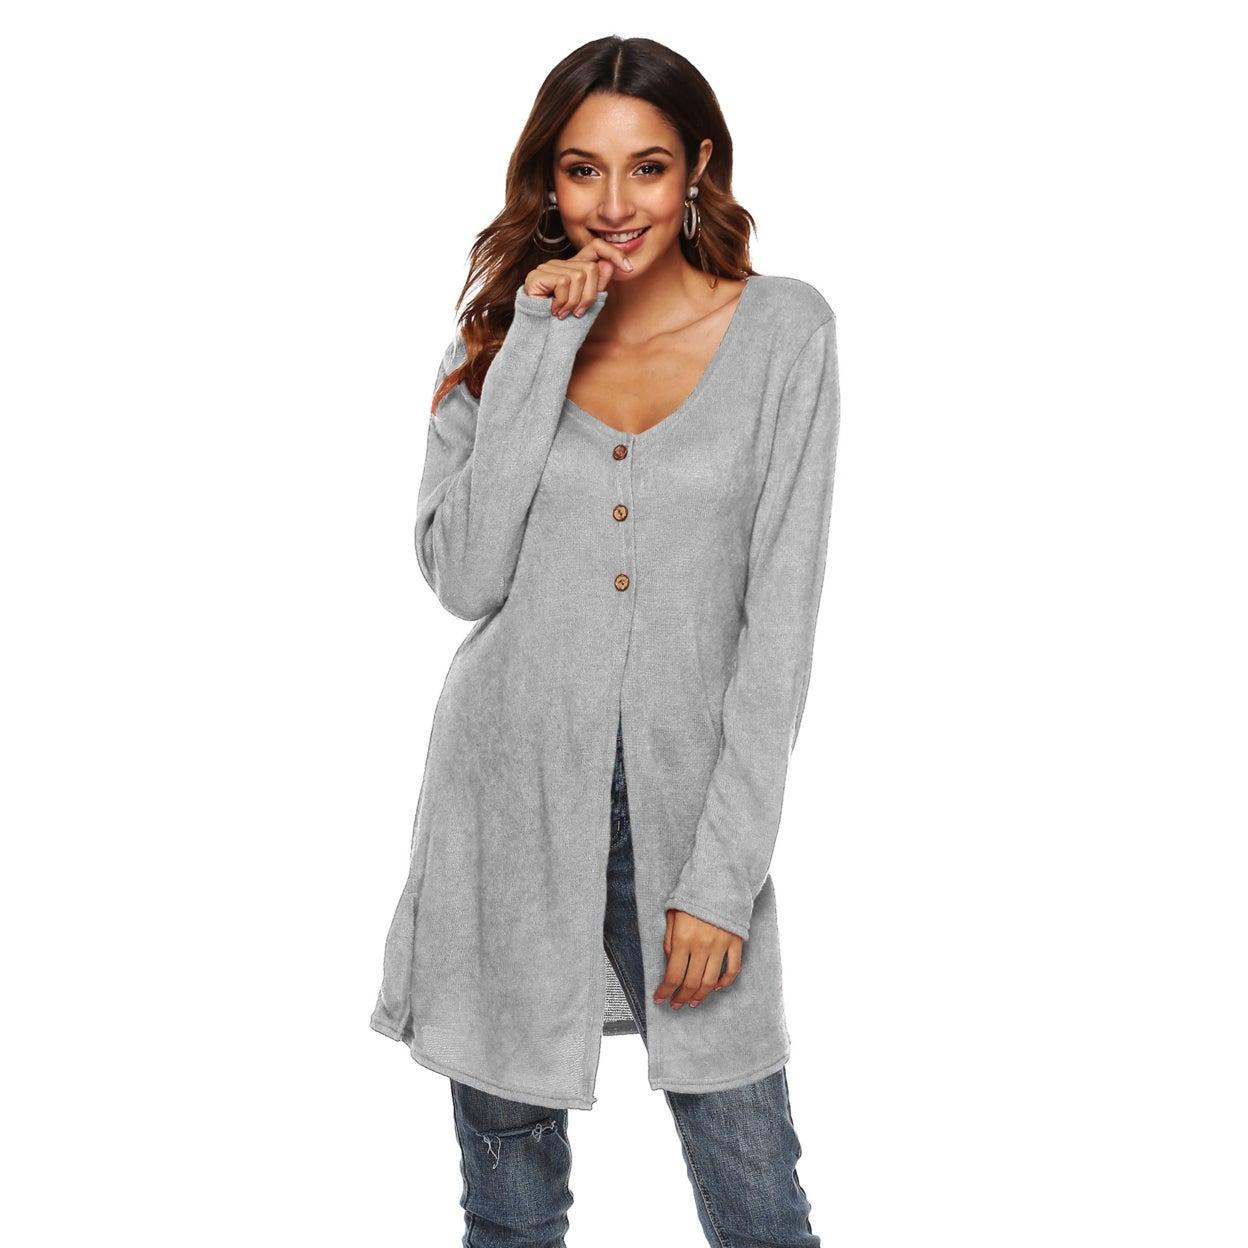 Women's Cardigan Sweater V Neck Button Down Knitwear Long Sleeve Soft Basic Knit Snap Cardigan Sweater